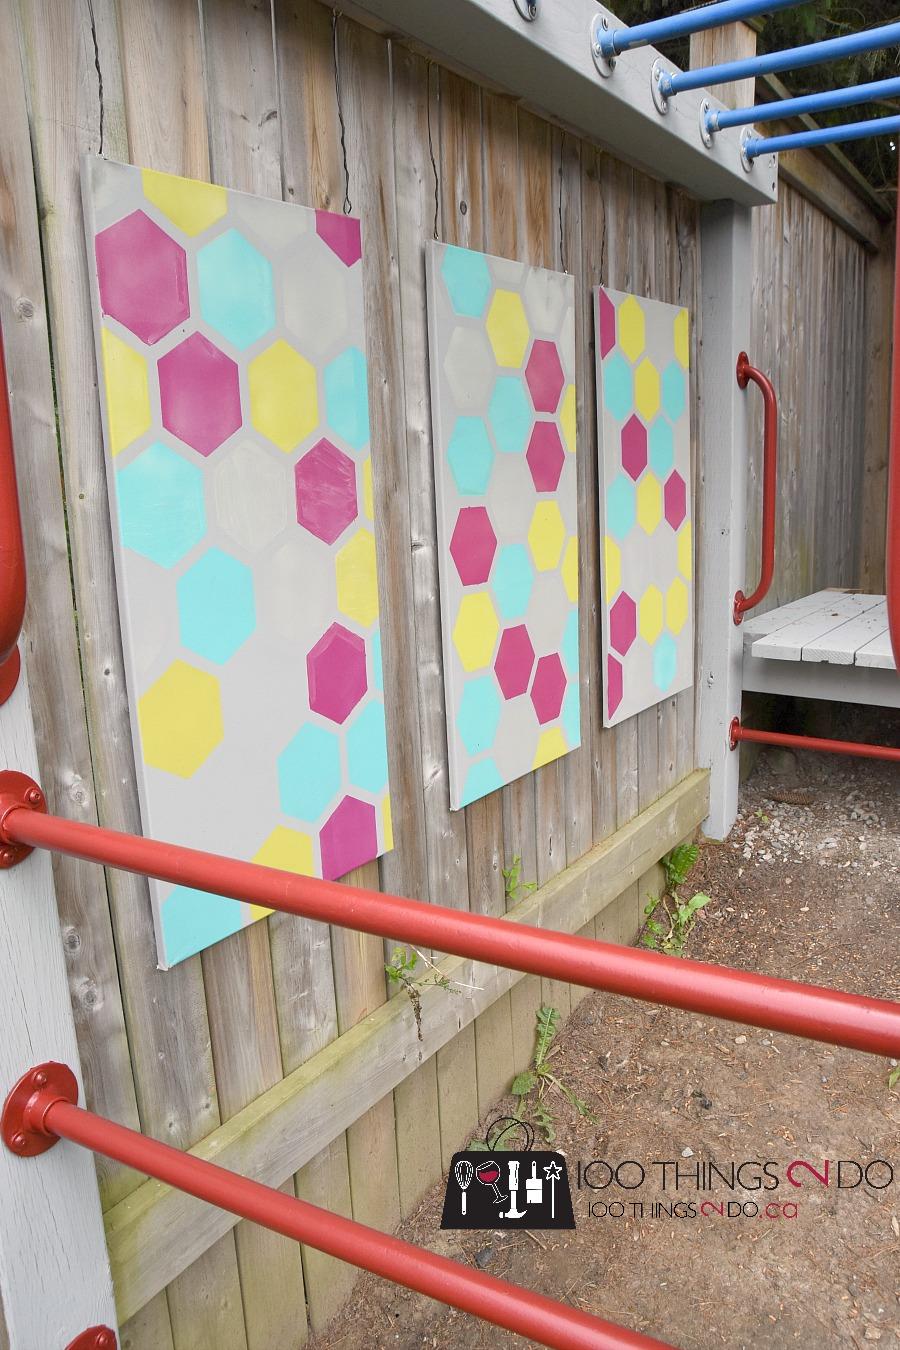 Outdoor art, outdoor decor, fence art, outdoor canvas, stencil art, playground upgrades